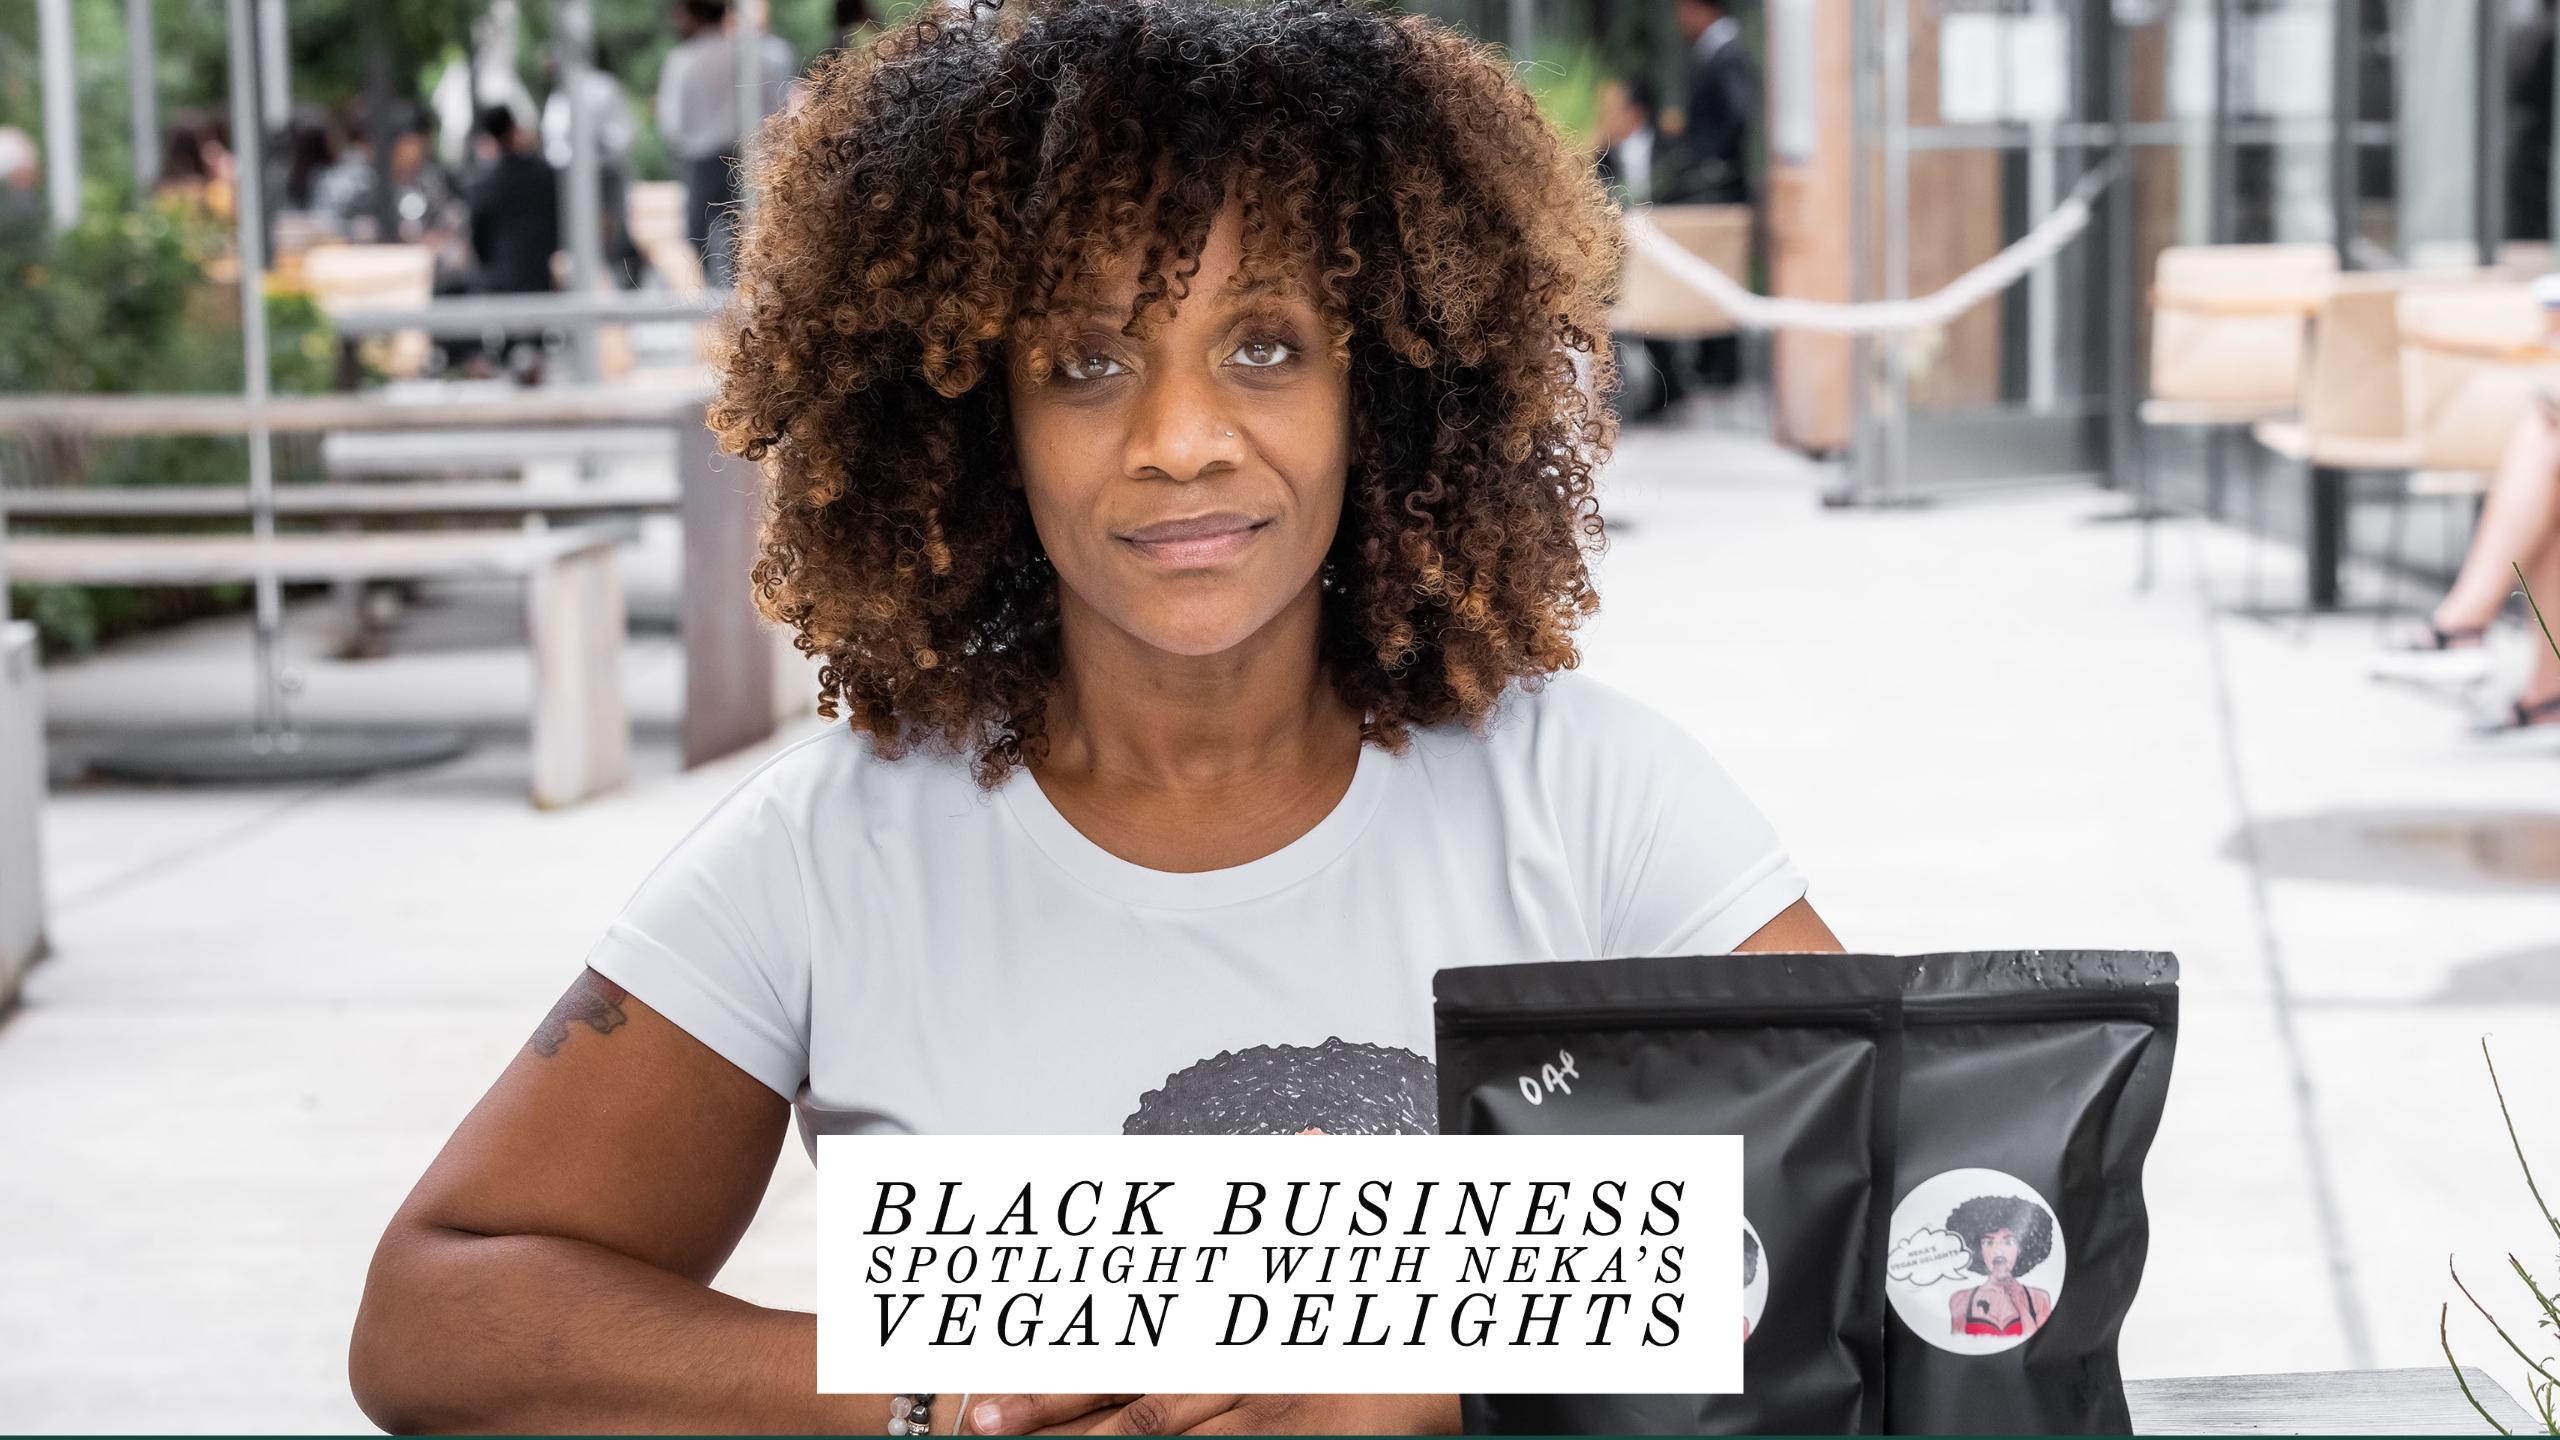 Black Business Spotlight with Neka's Vegan Delights.